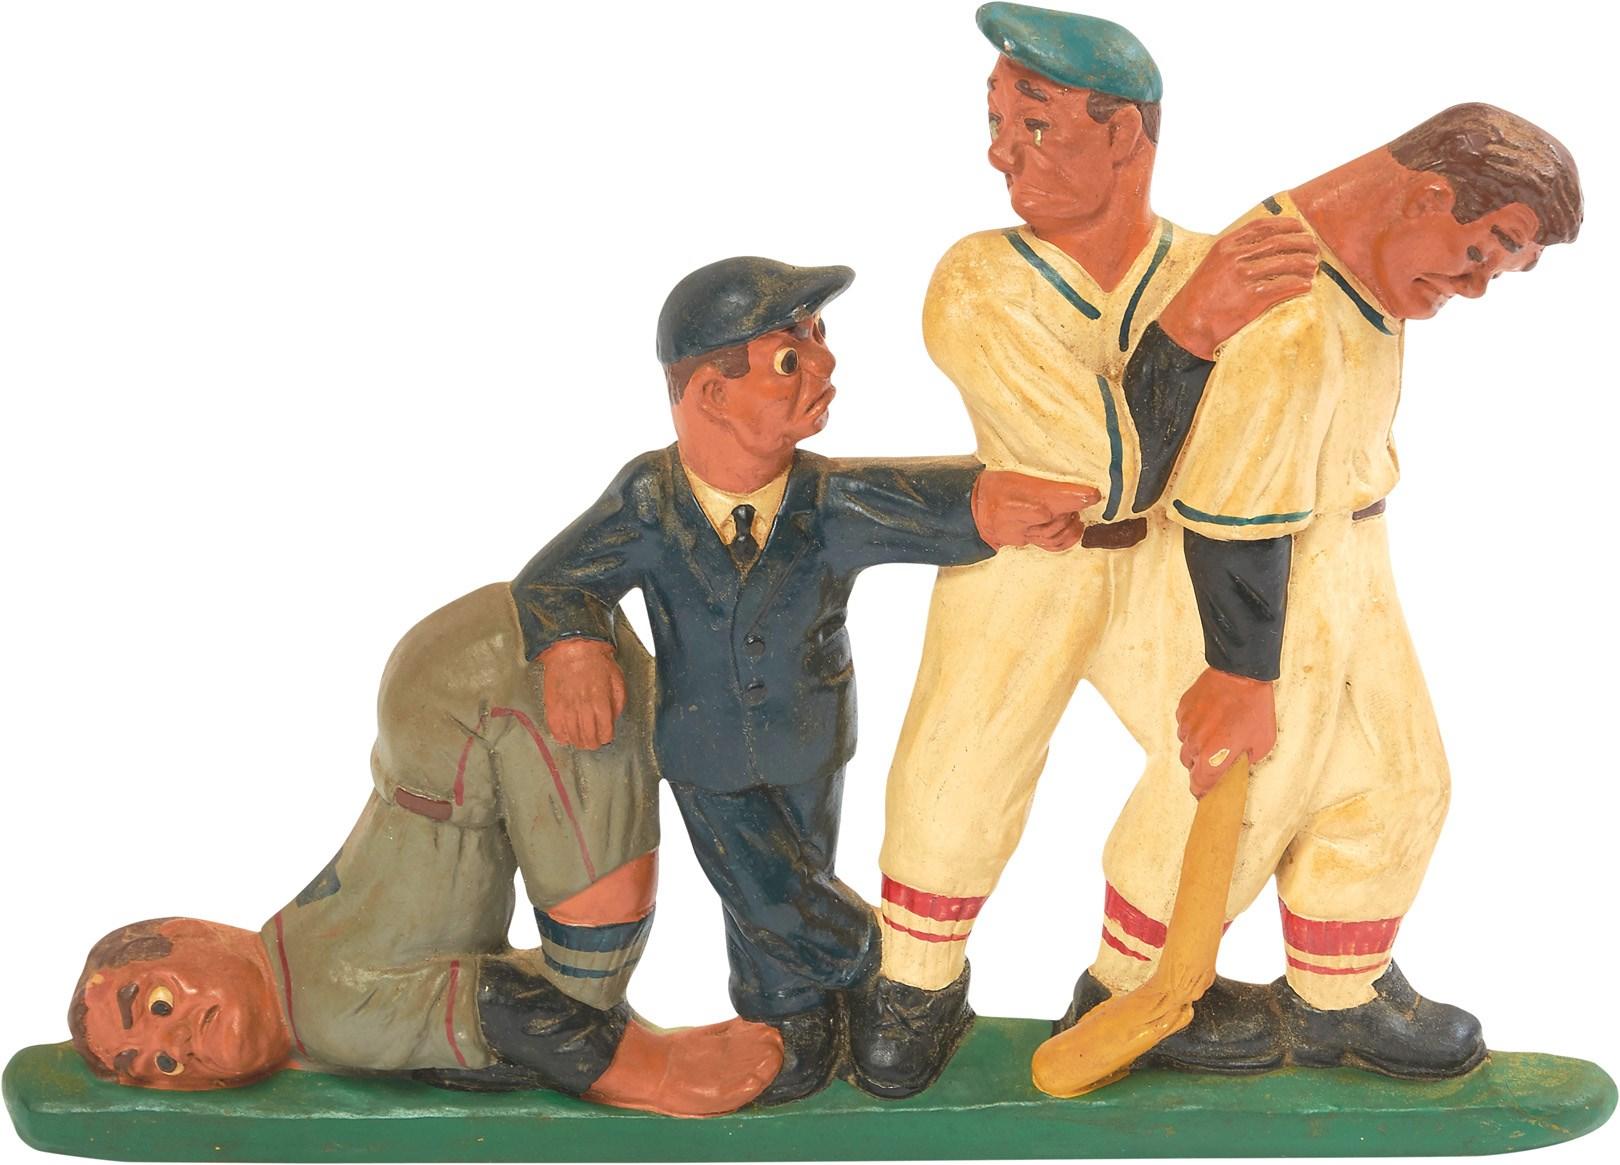 Baseball Memorabilia - Leland's Classic